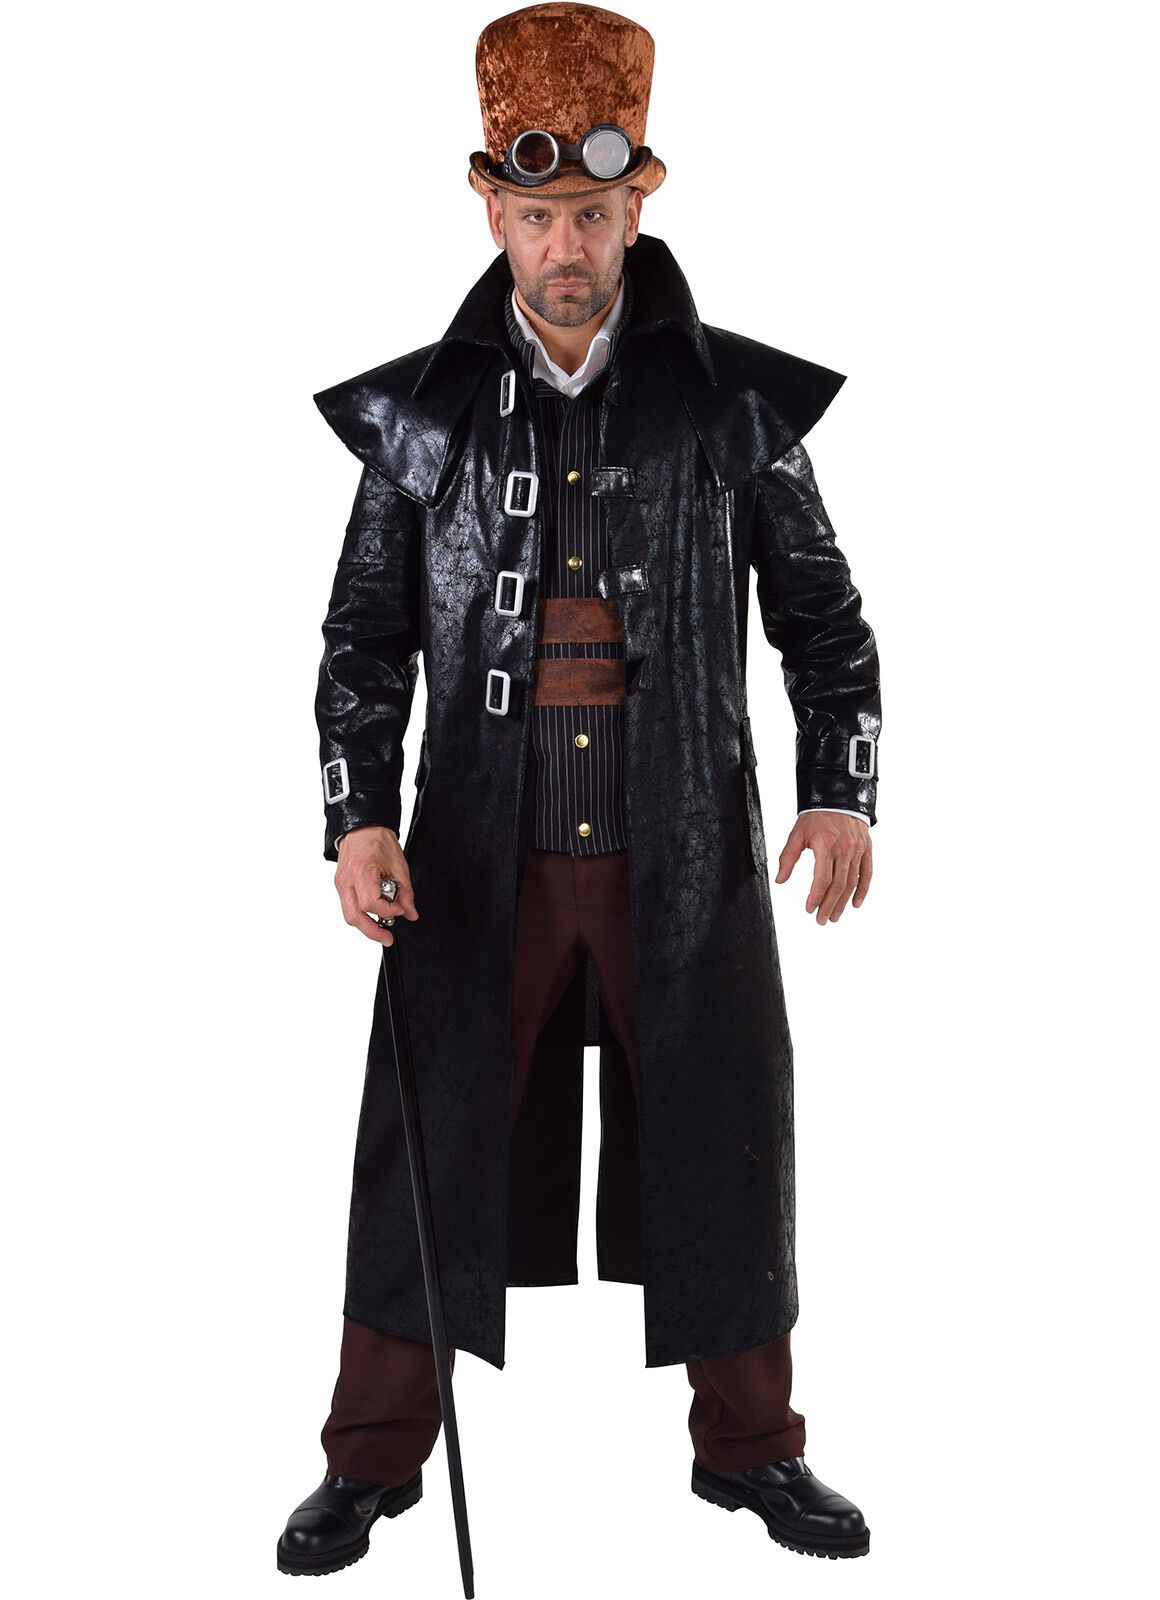 Trench Coat - Tough Man , Villain /Maverick/Highwayman/ Steam punk